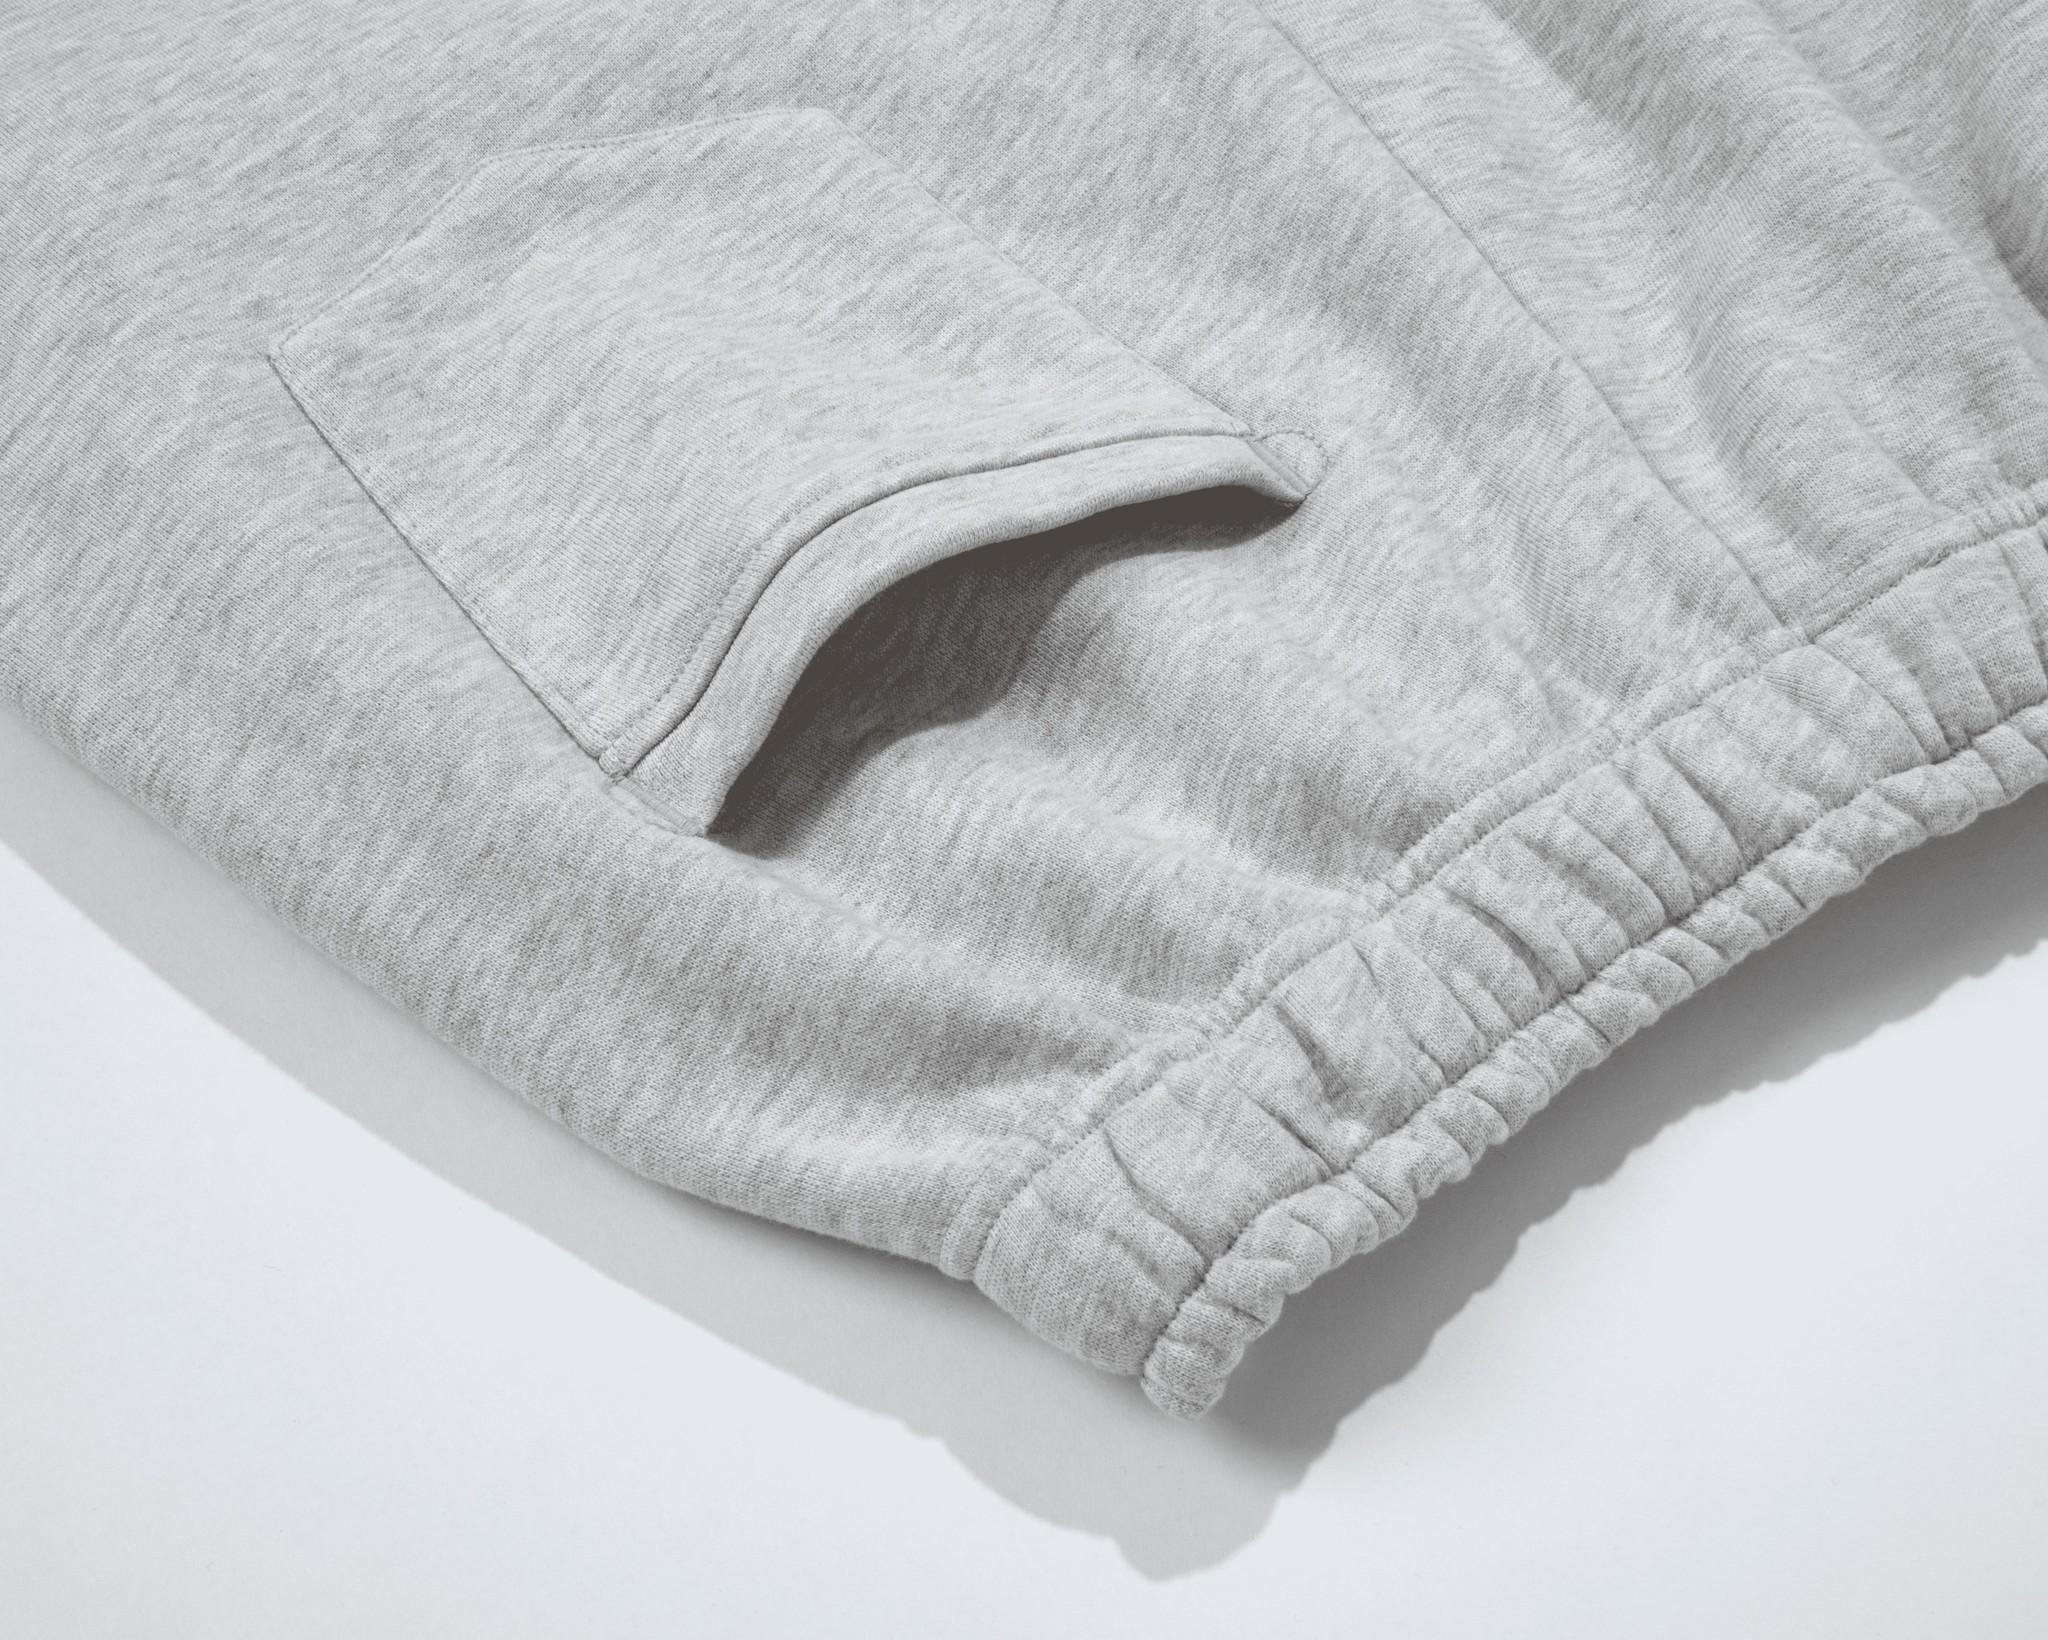 PAL Jock sweatpants light gray marl